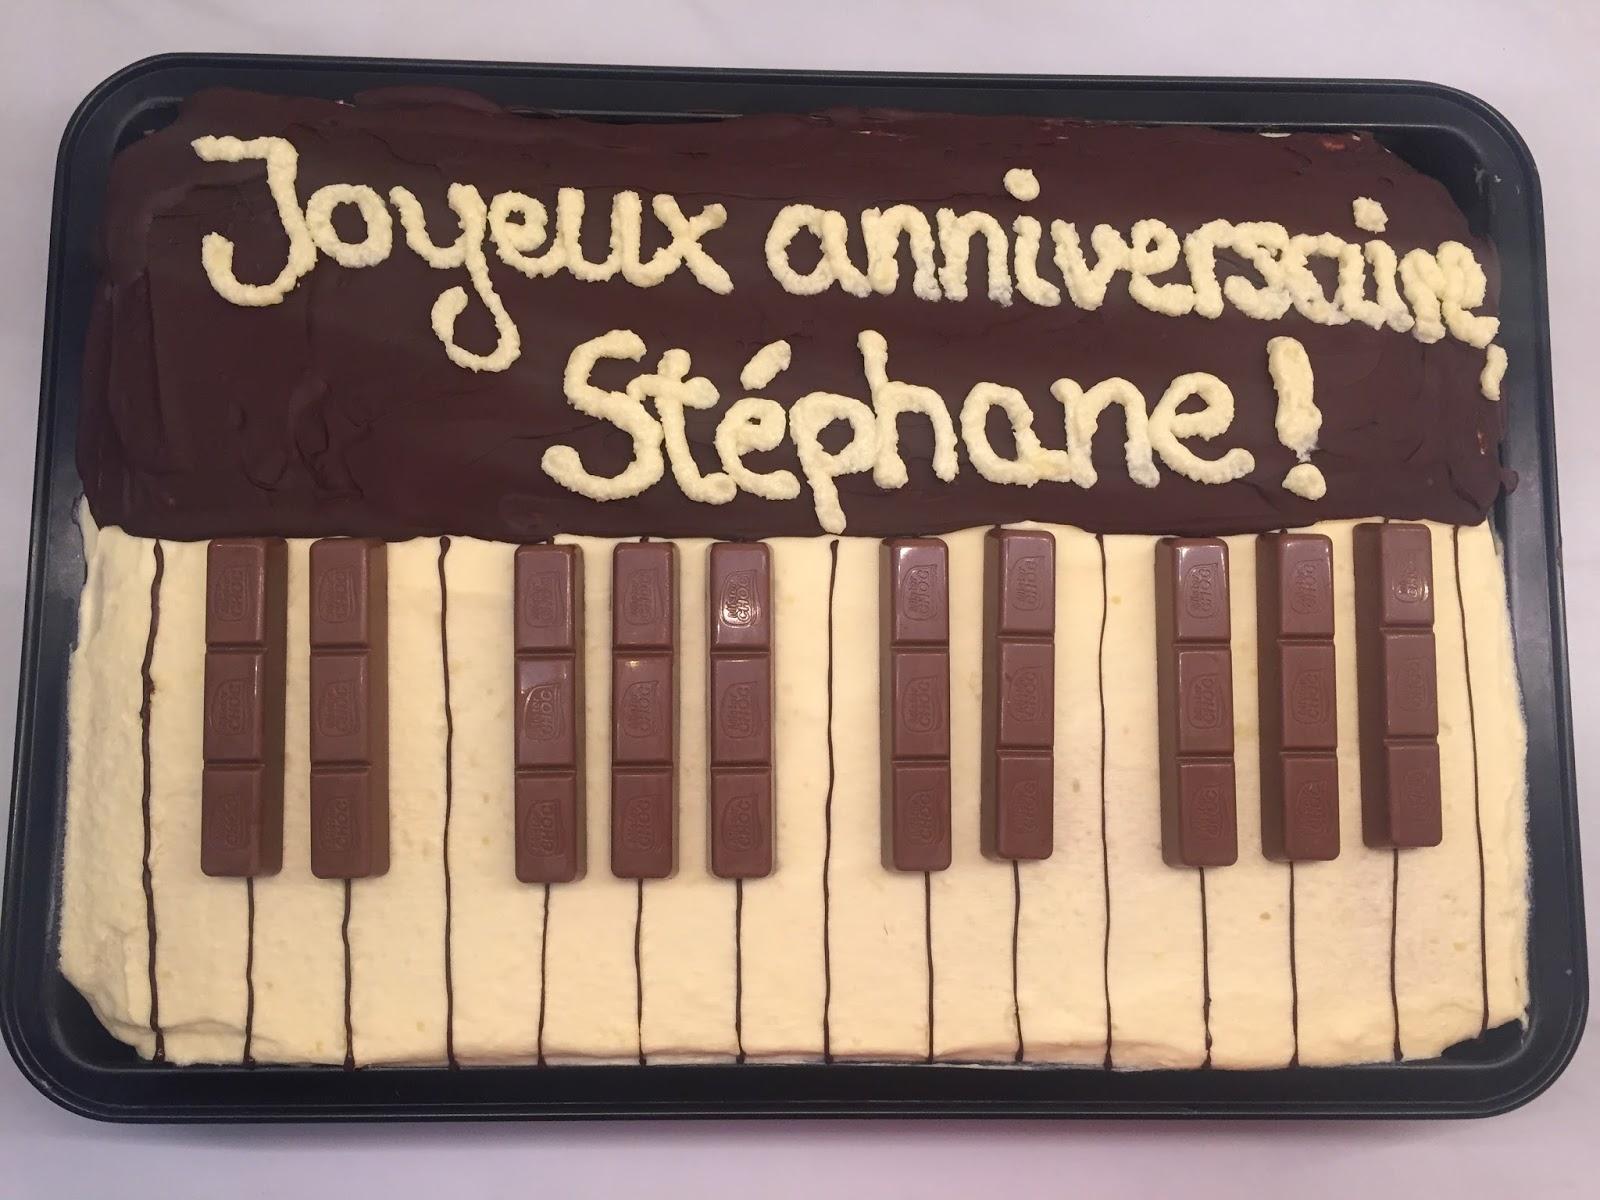 Patisserie Nadine Donauwellen Piano Kuchen Fur Stephane